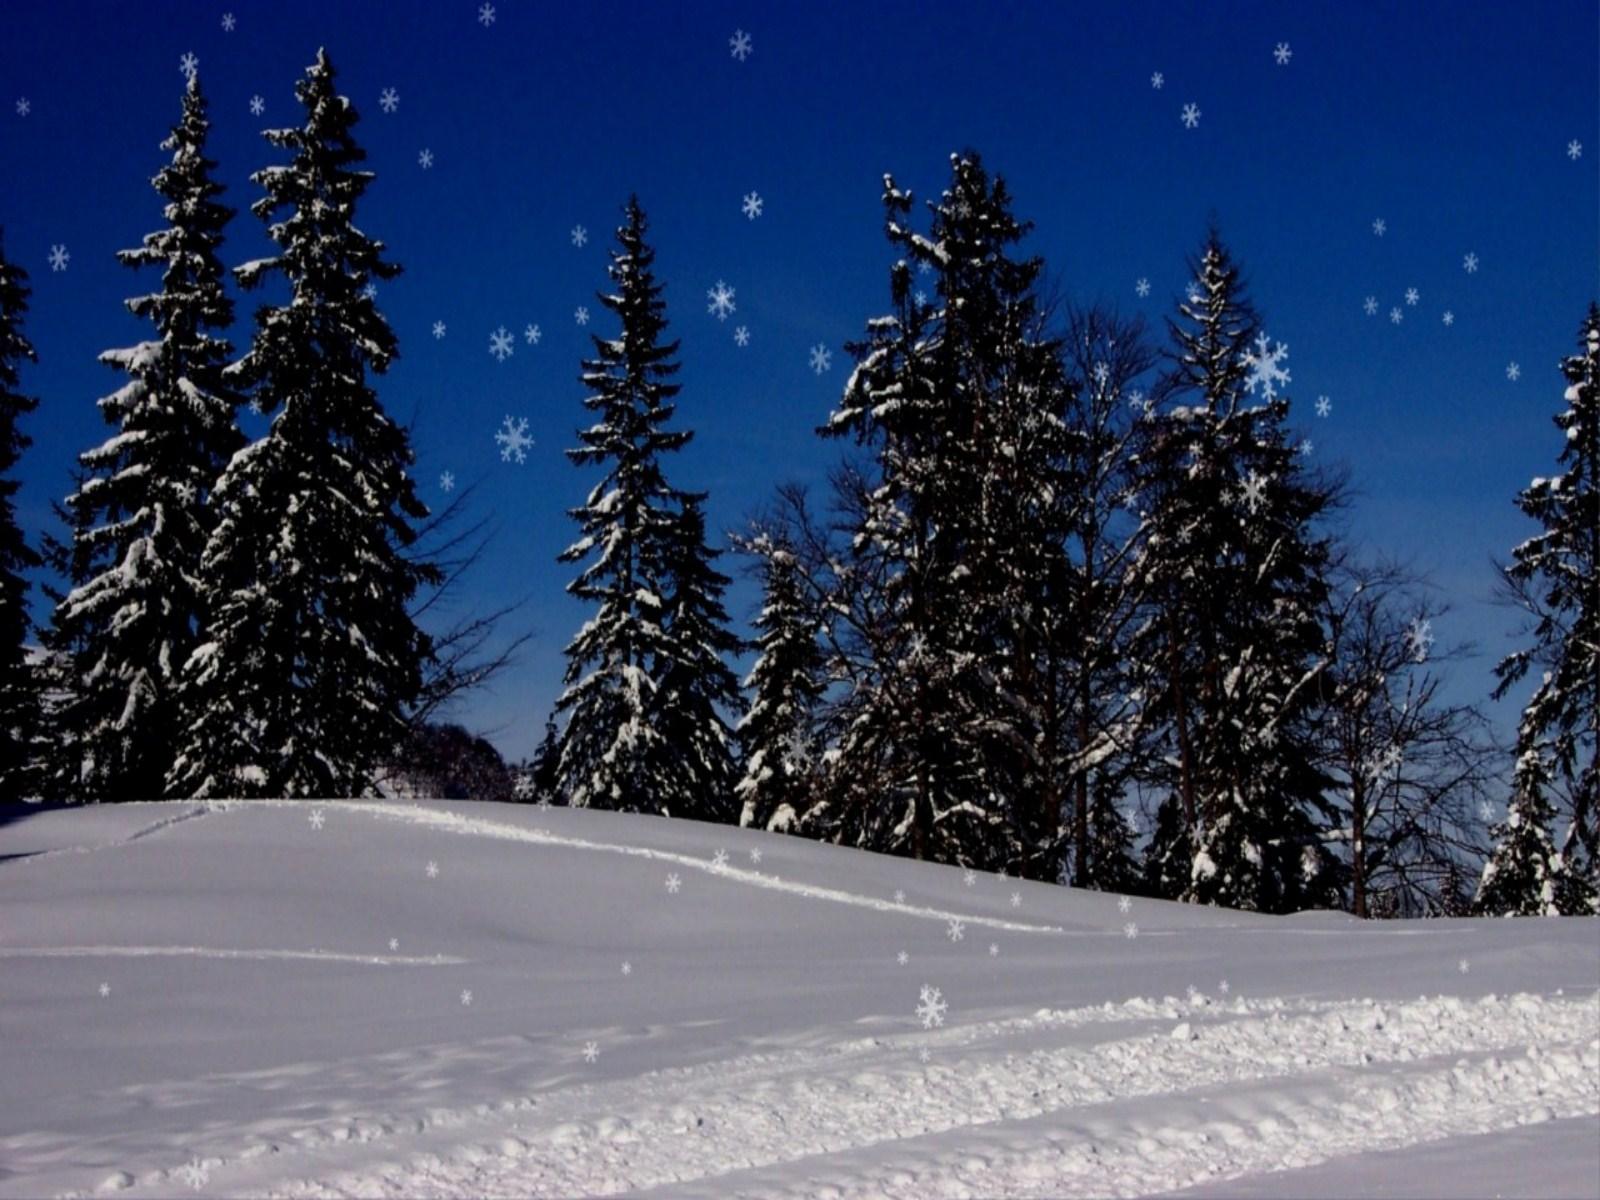 snow globe live wallpaper free download